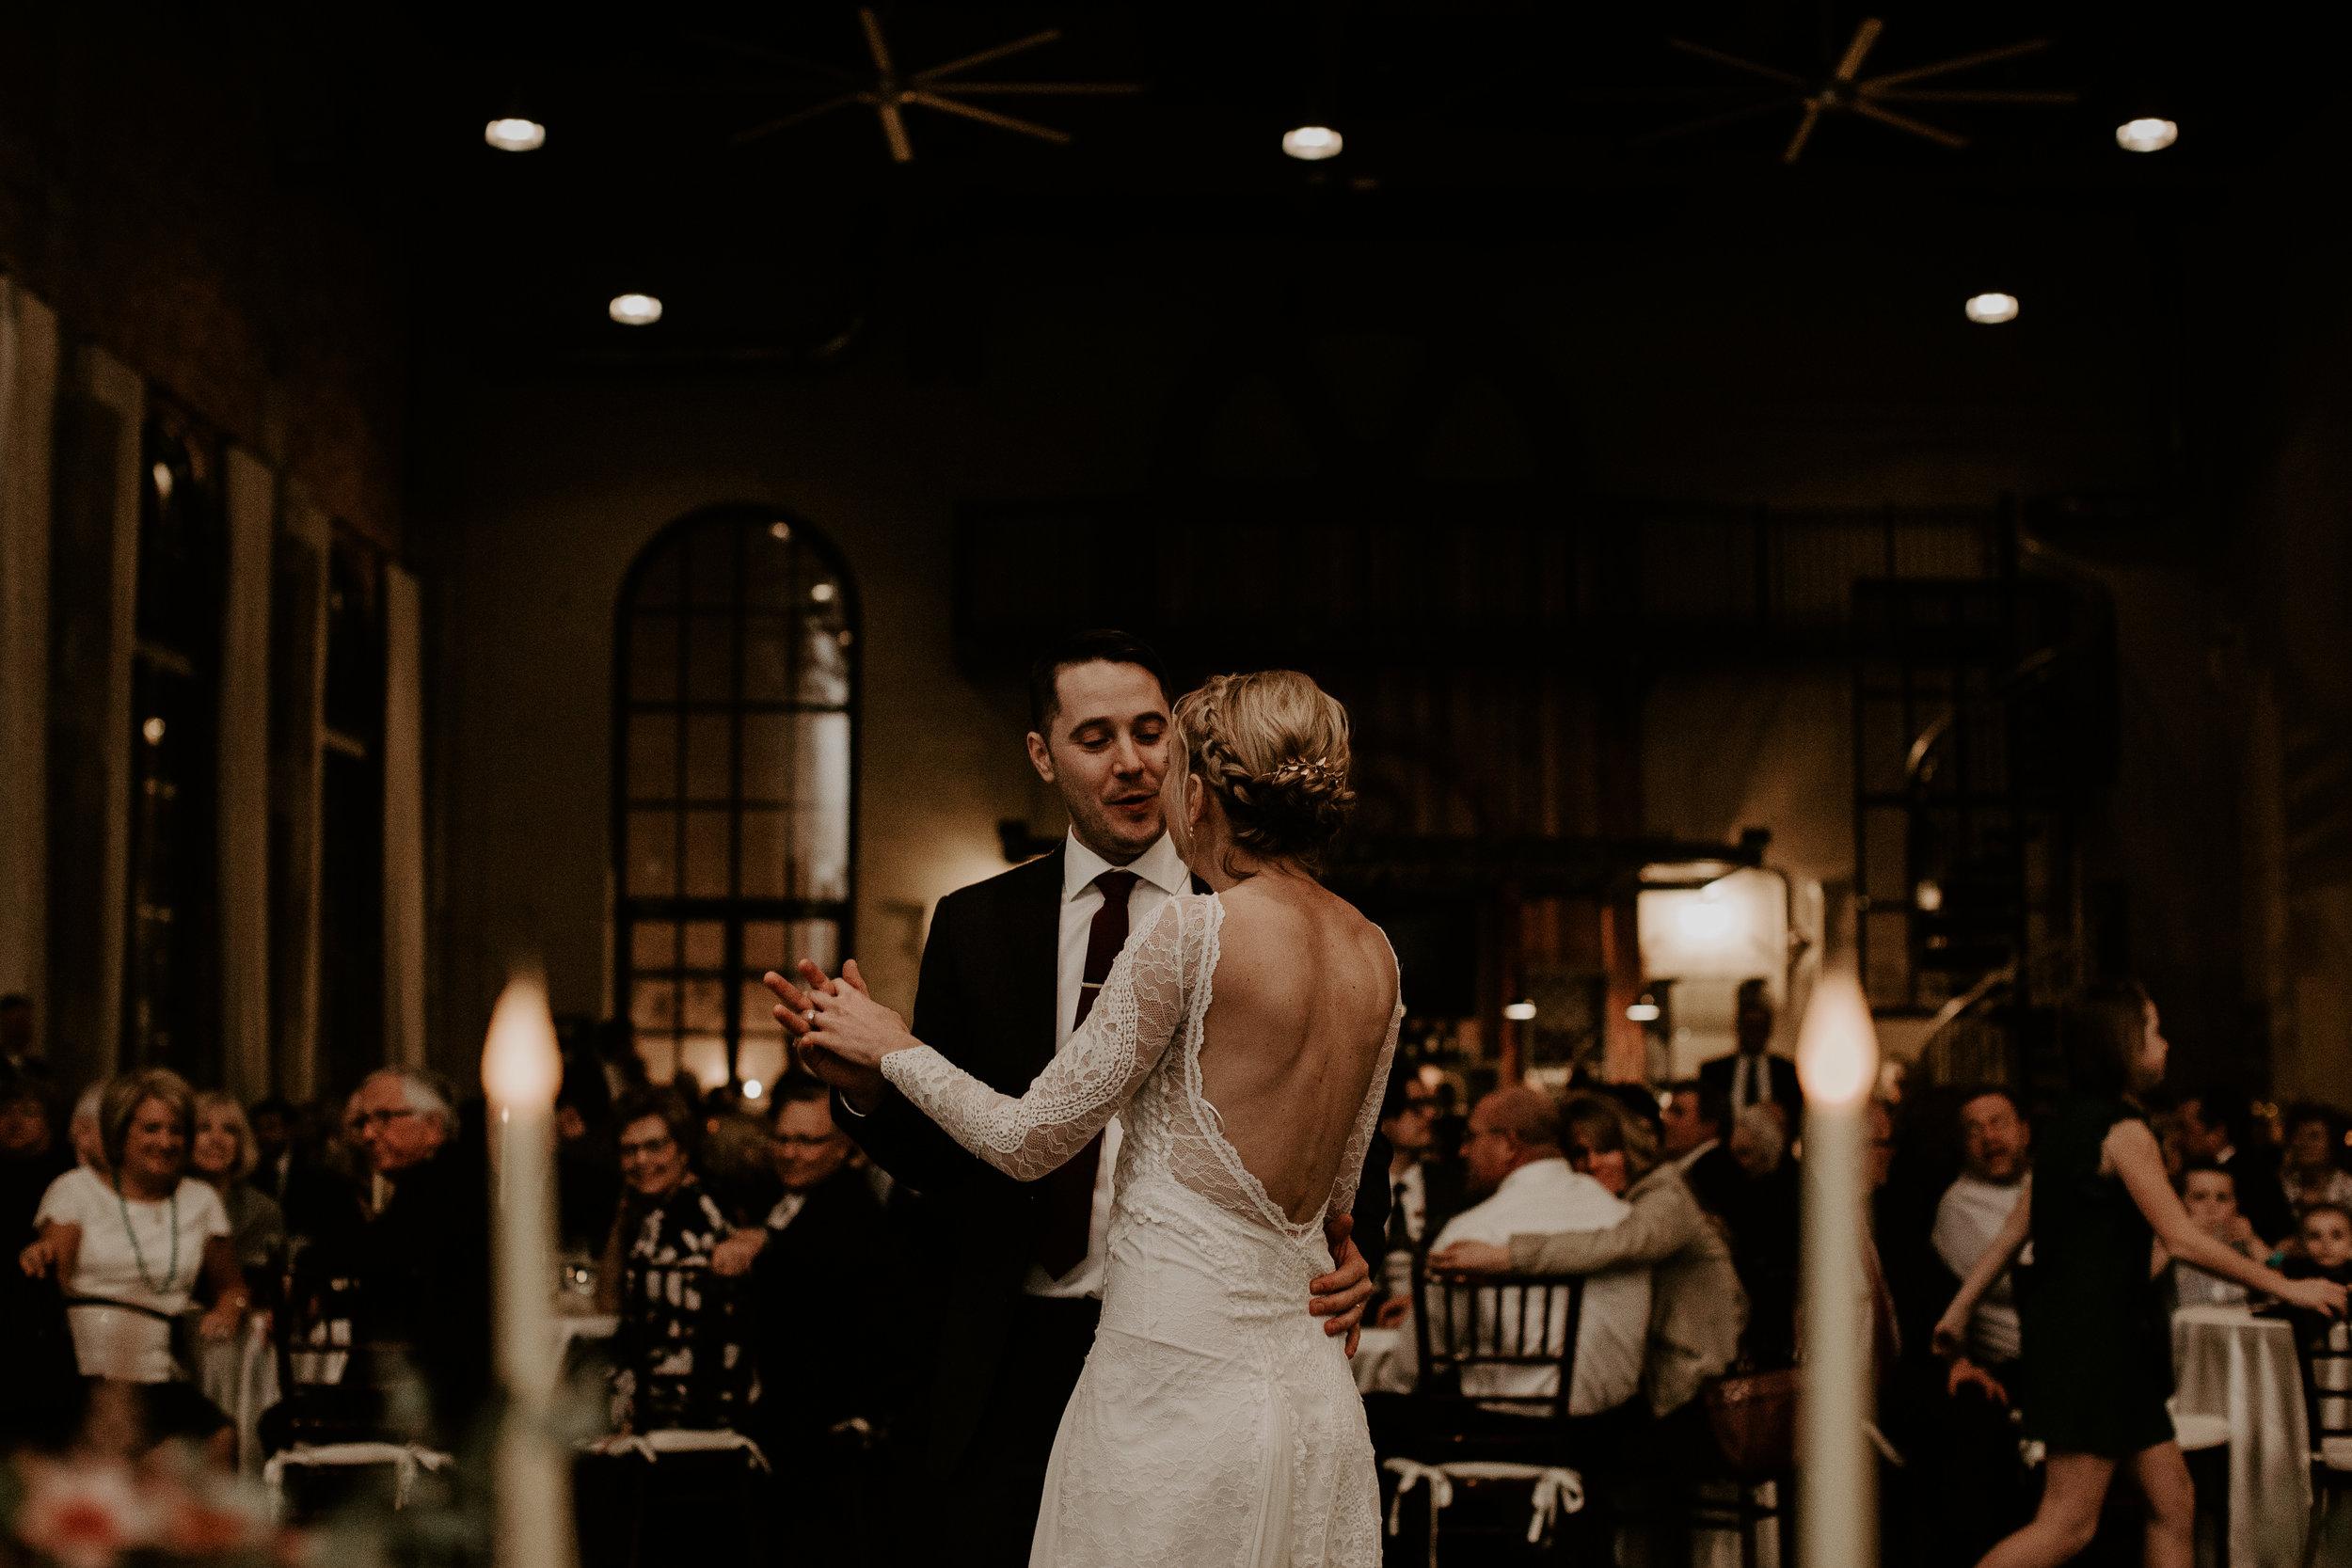 The_Steam_Plant_Dayton_Wedding-EDIT-565.jpg